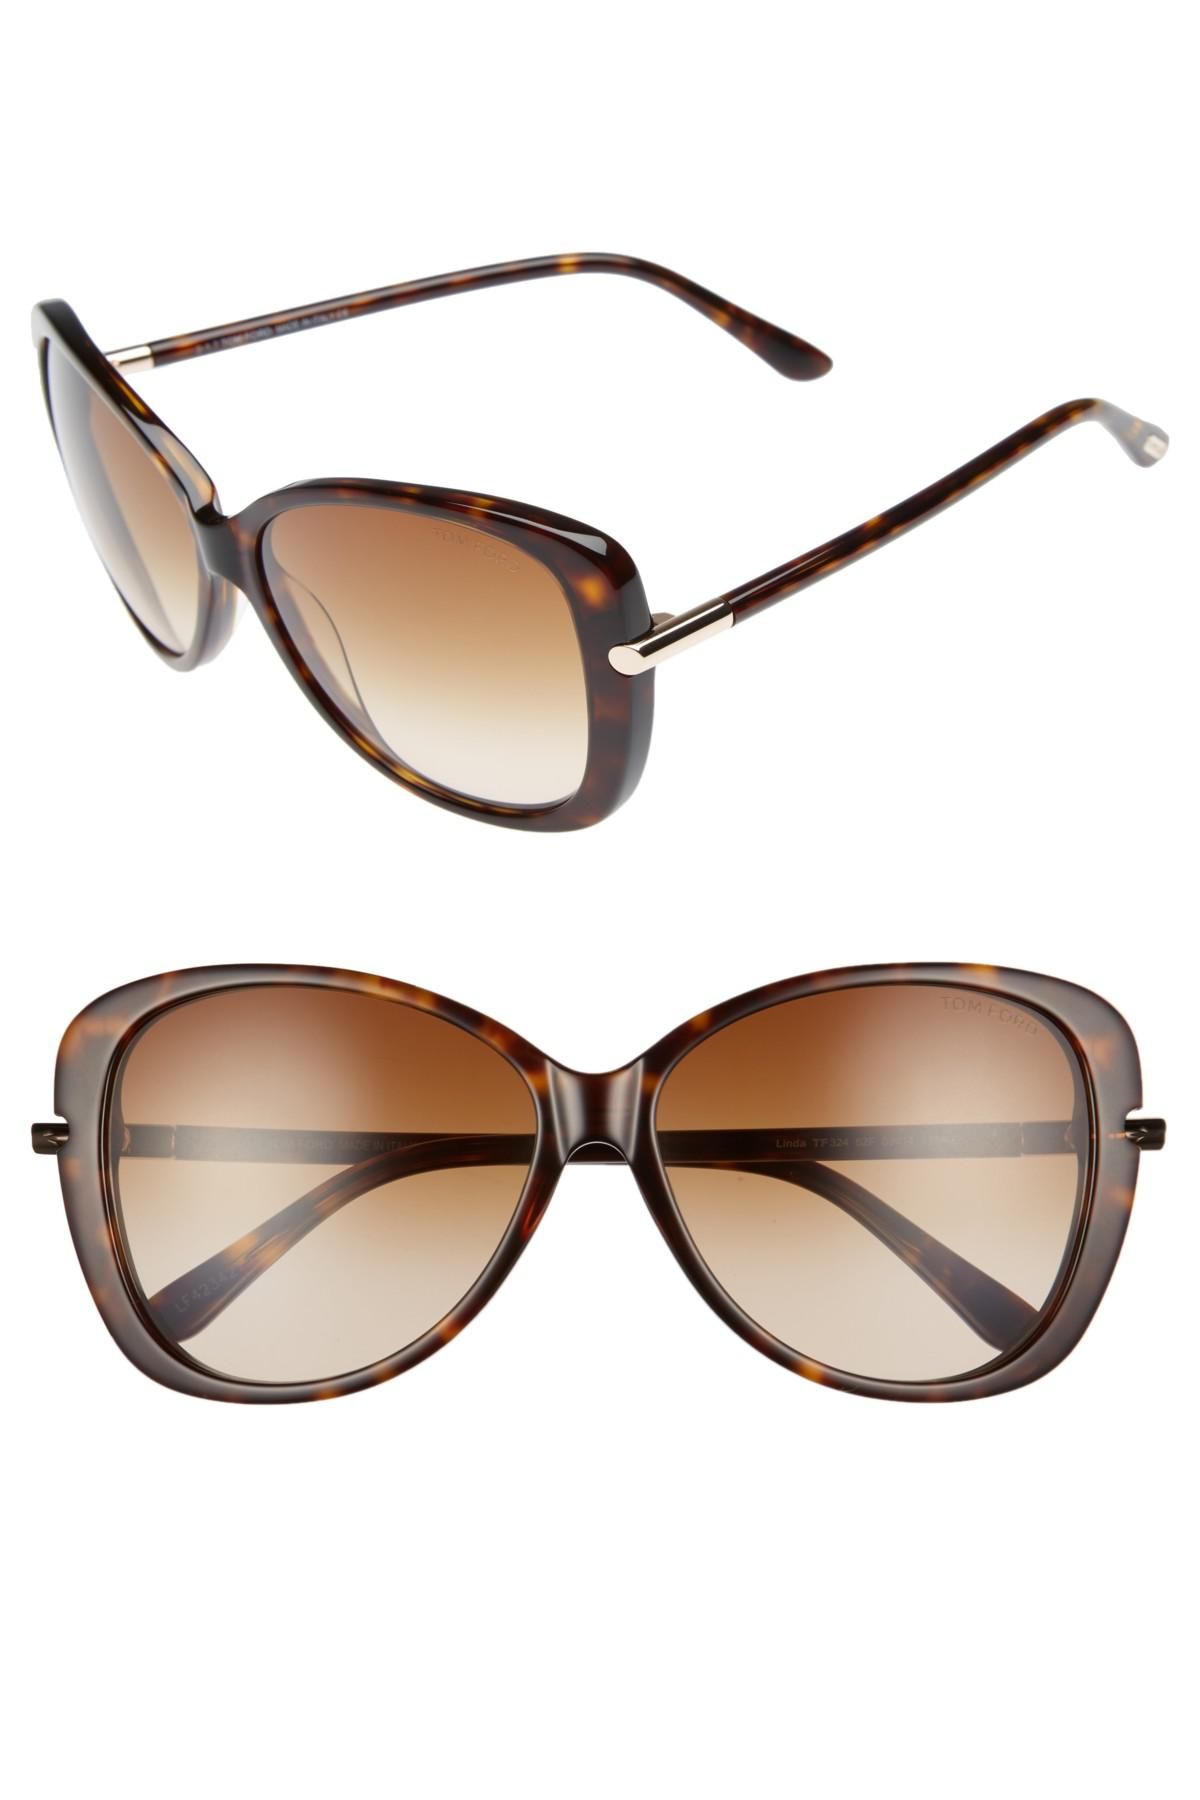 9f198d032df6c Lyst - Tom Ford Linda 59mm Gradient Butterfly Sunglasses - Dark ...